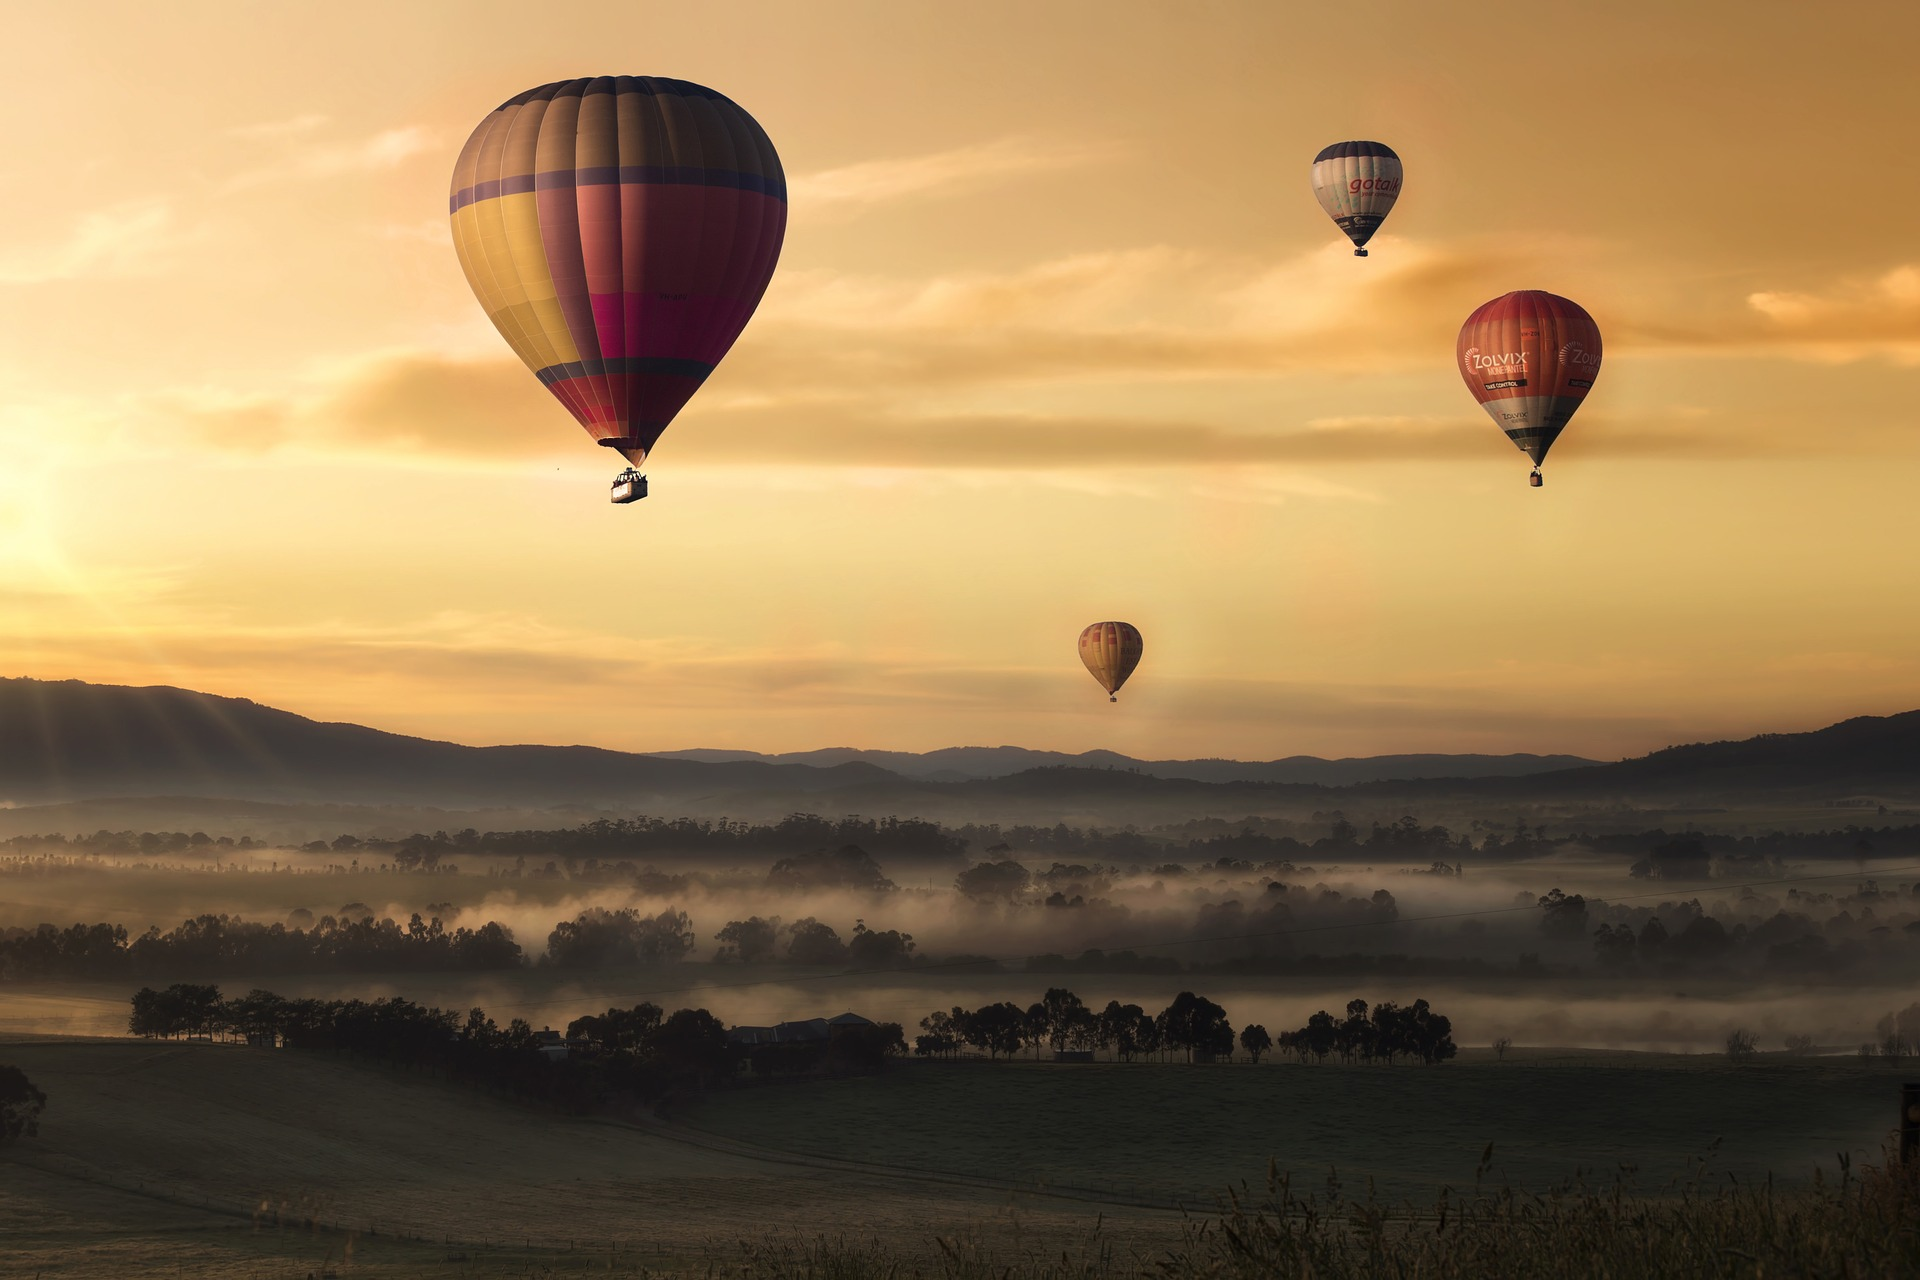 ballon, Vallée de, Sky, flotteur, Jaune, brouillard - Fonds d'ecran - Professor-falken.com